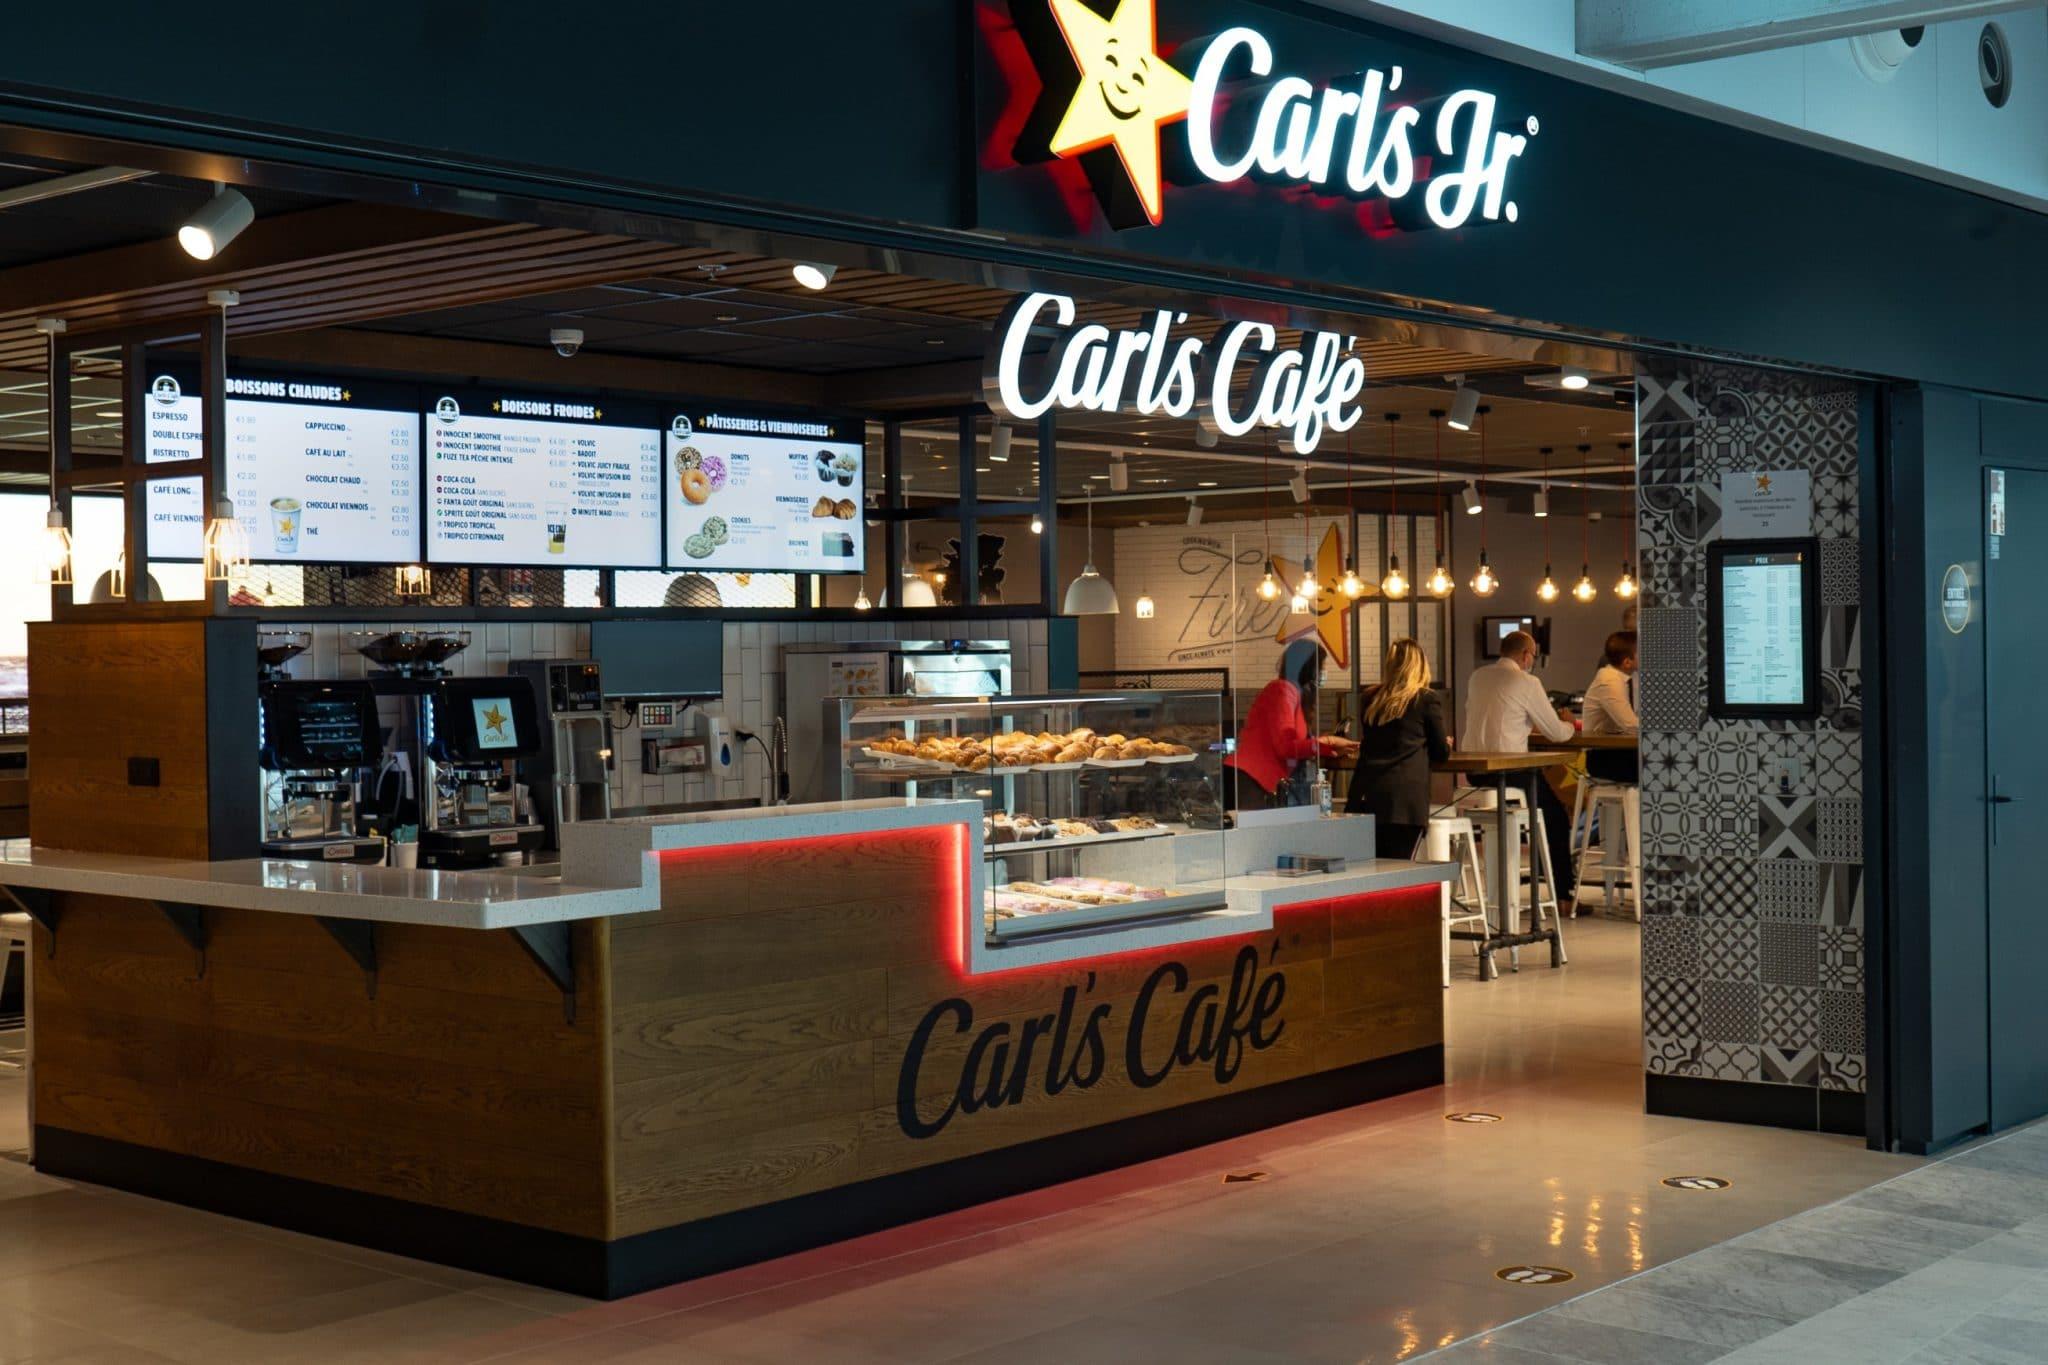 carl's jr paris aeroport carl's jr café barista burger milkshake